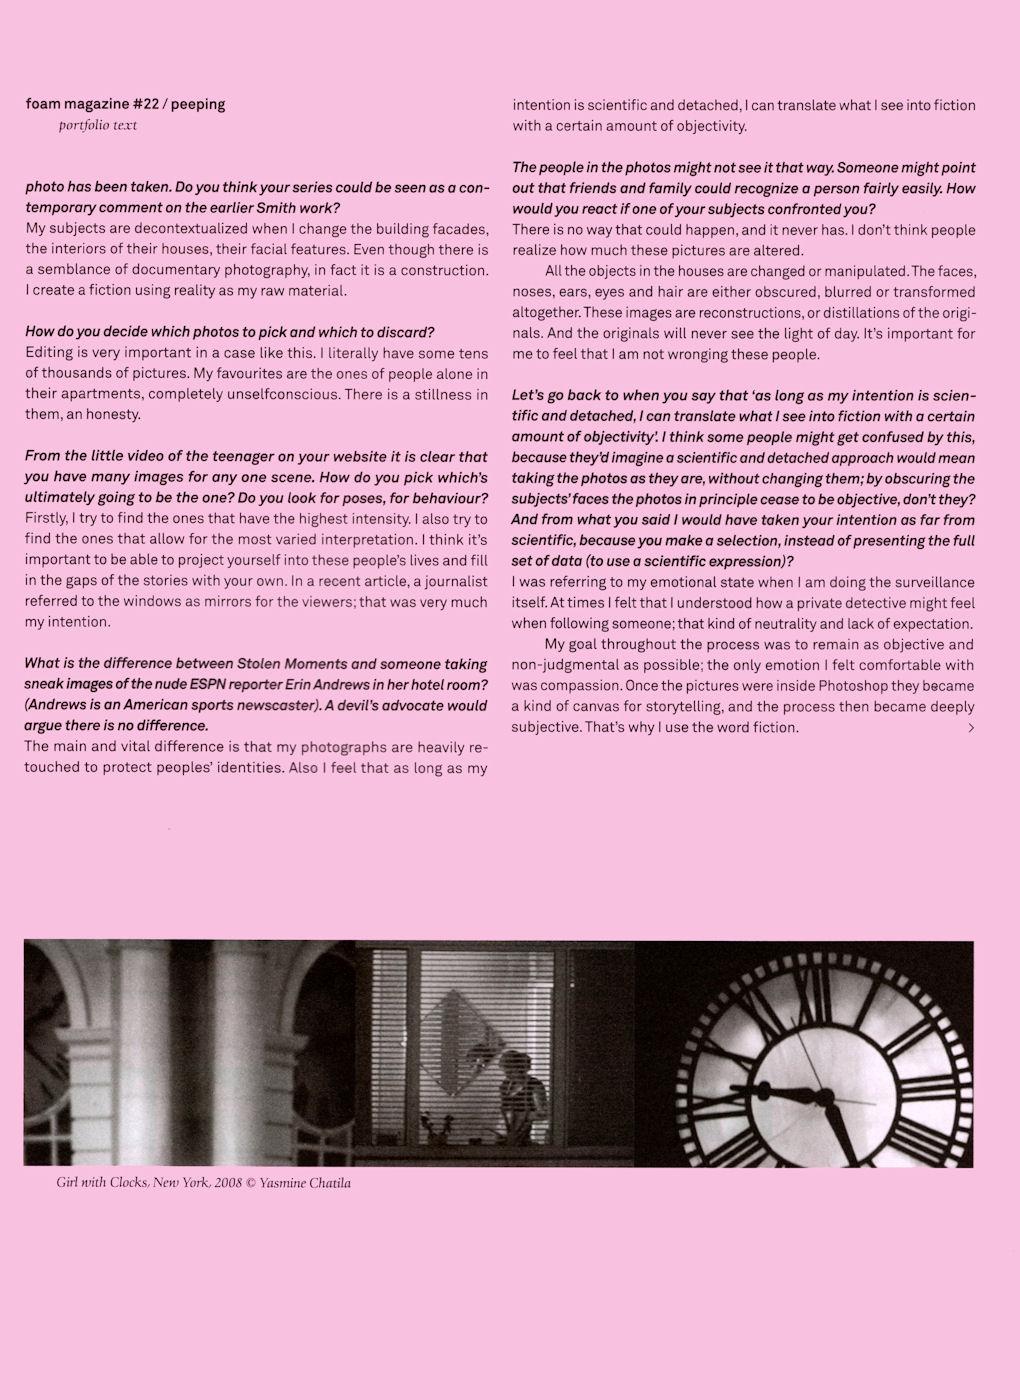 Foam Magazine (Amsterdam)